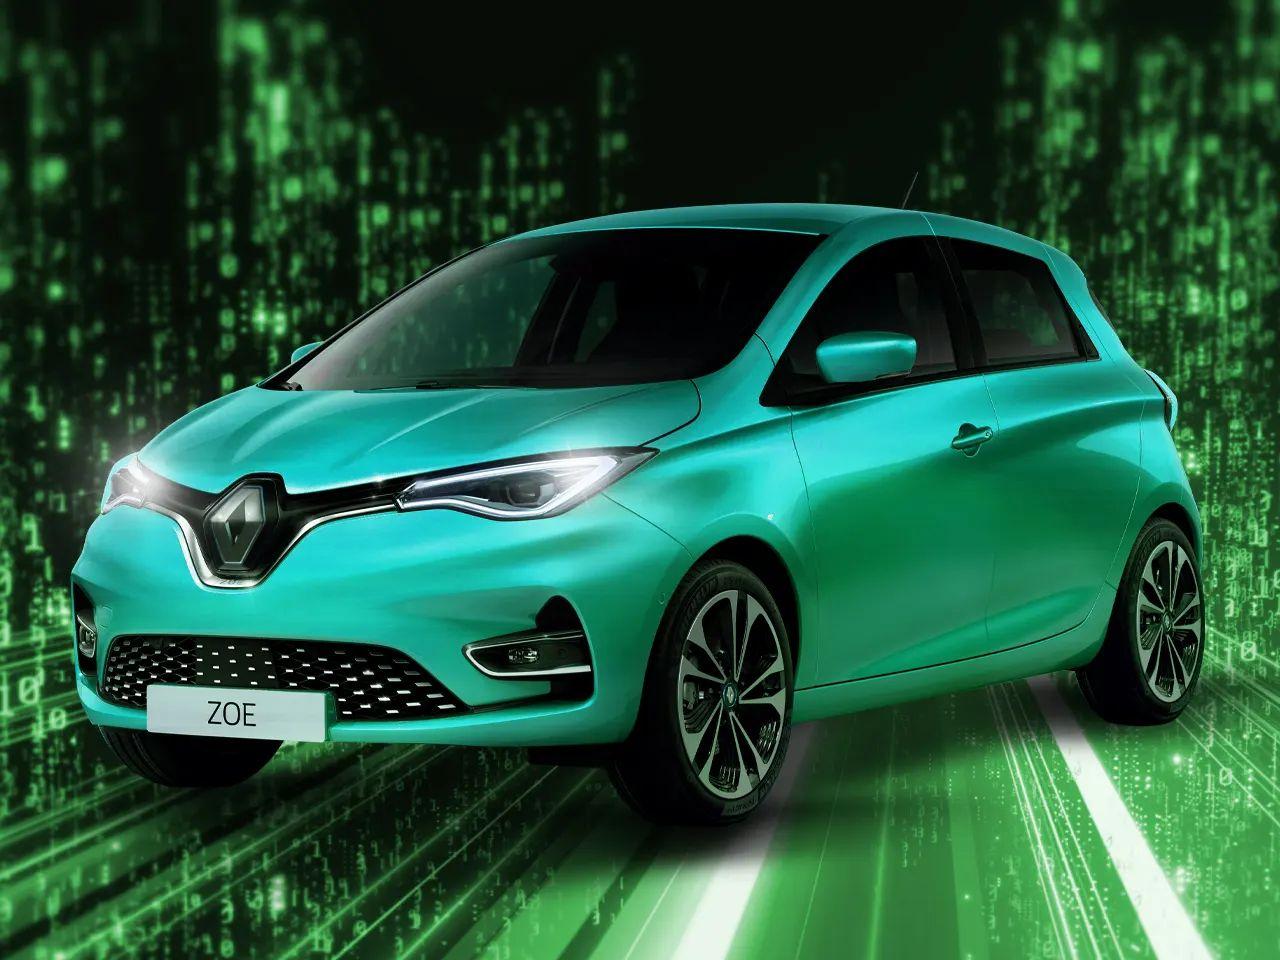 Renault Zoe Leasing eff. Kostenlos zzgl. 210€ Bereitstellung [Gewerbe]